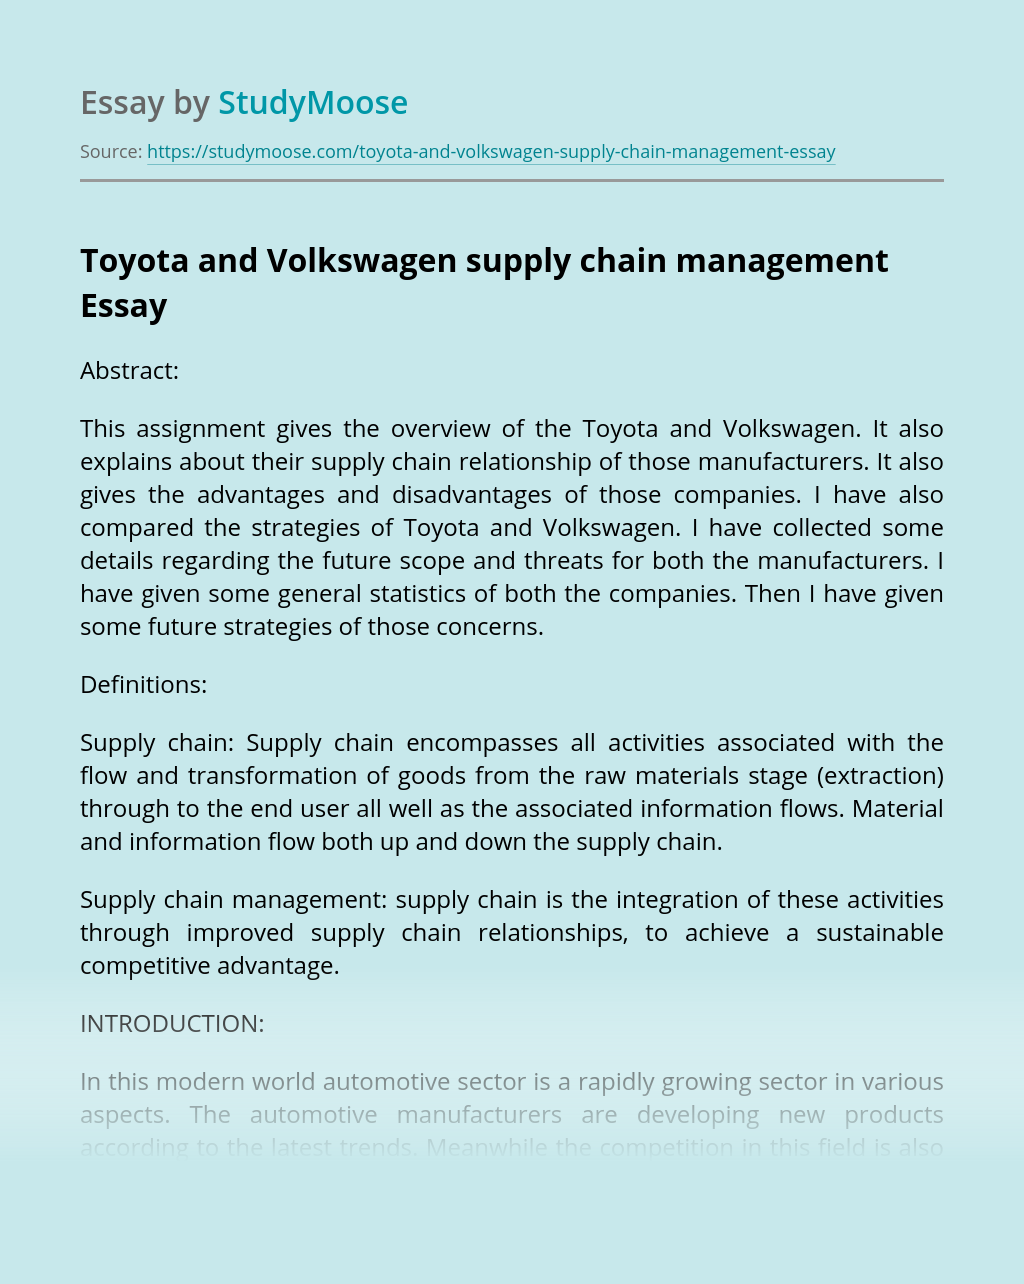 Toyota and Volkswagen supply chain management